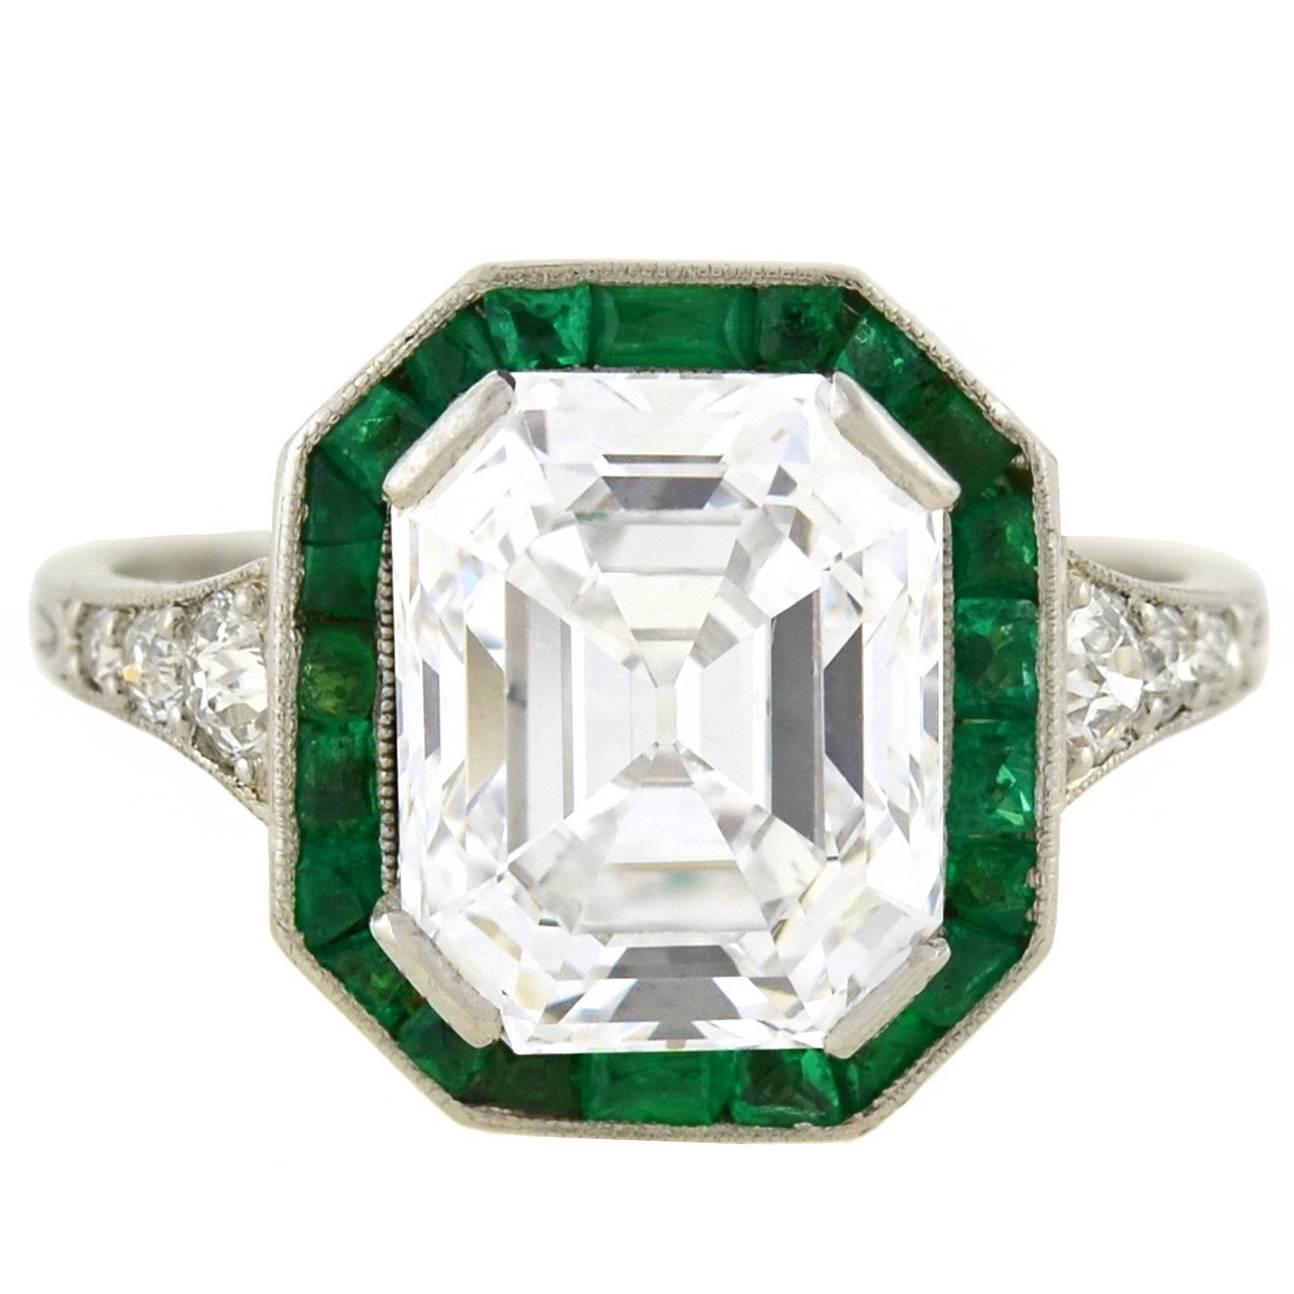 art deco colorless 3.63 carat emerald cut diamond engagement ring